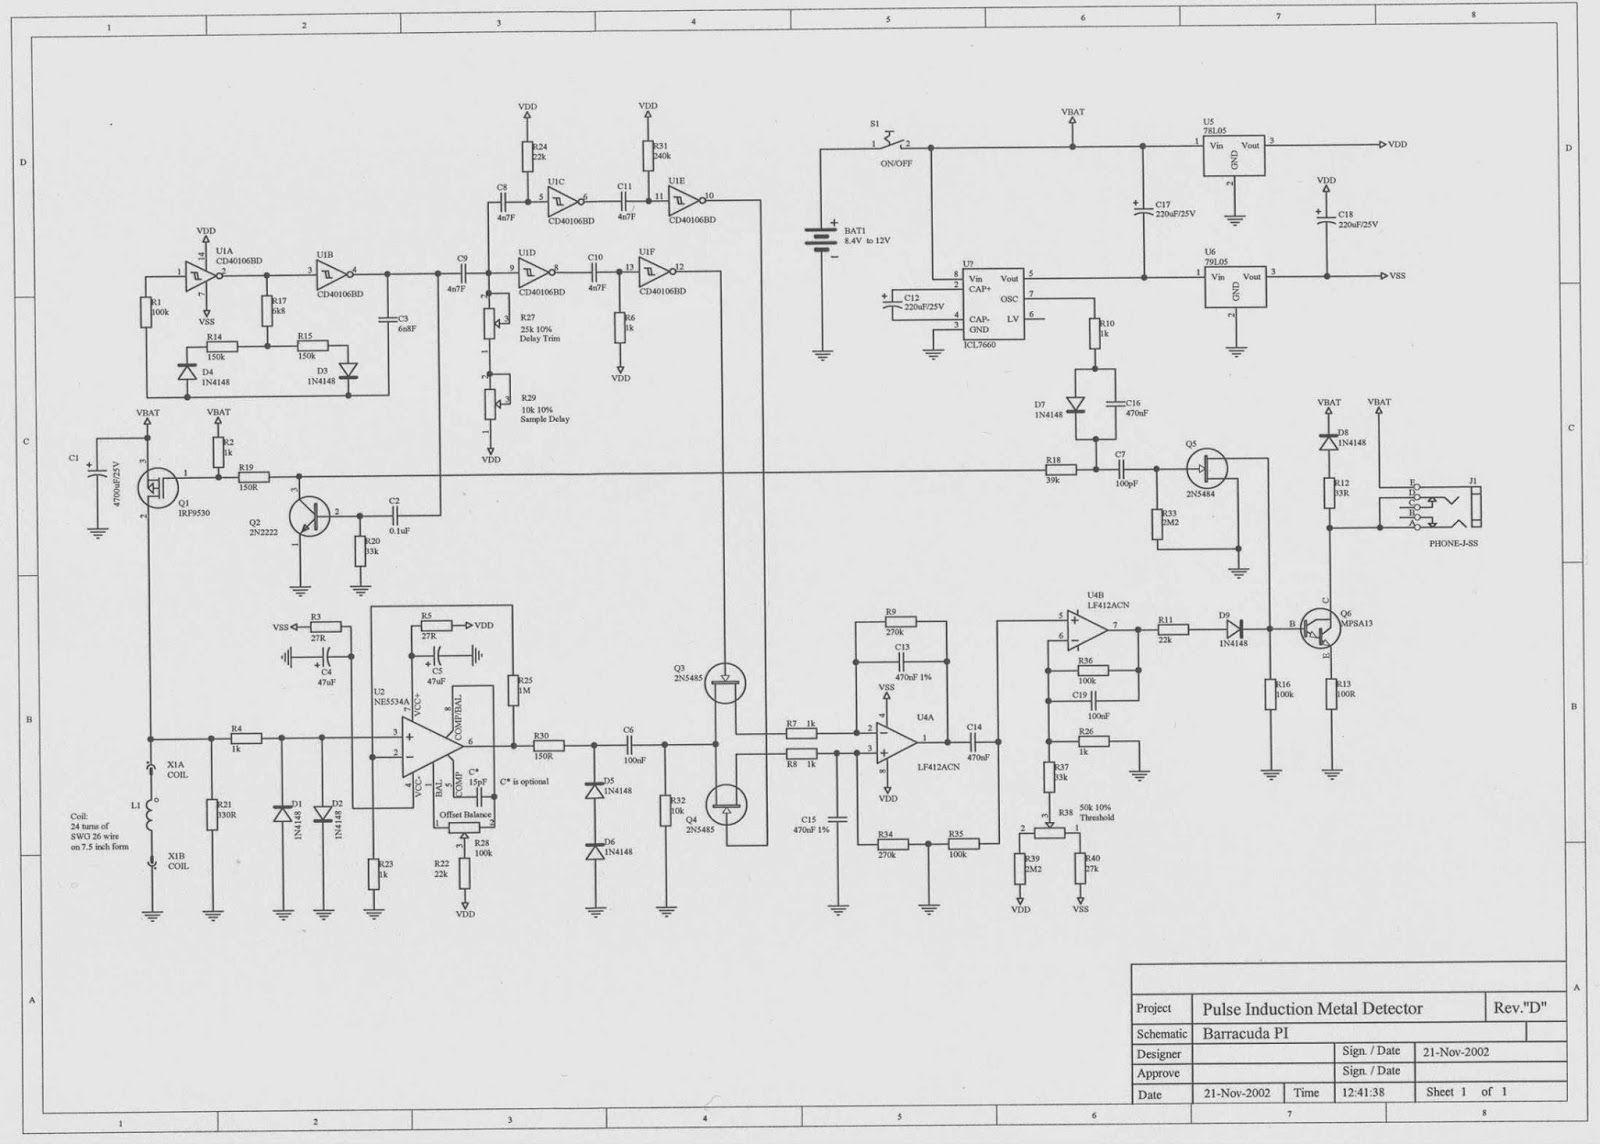 gold detector circuit diagram vauxhall vectra c wiring barracuda pre2 jpg 16001144 metal pinterest